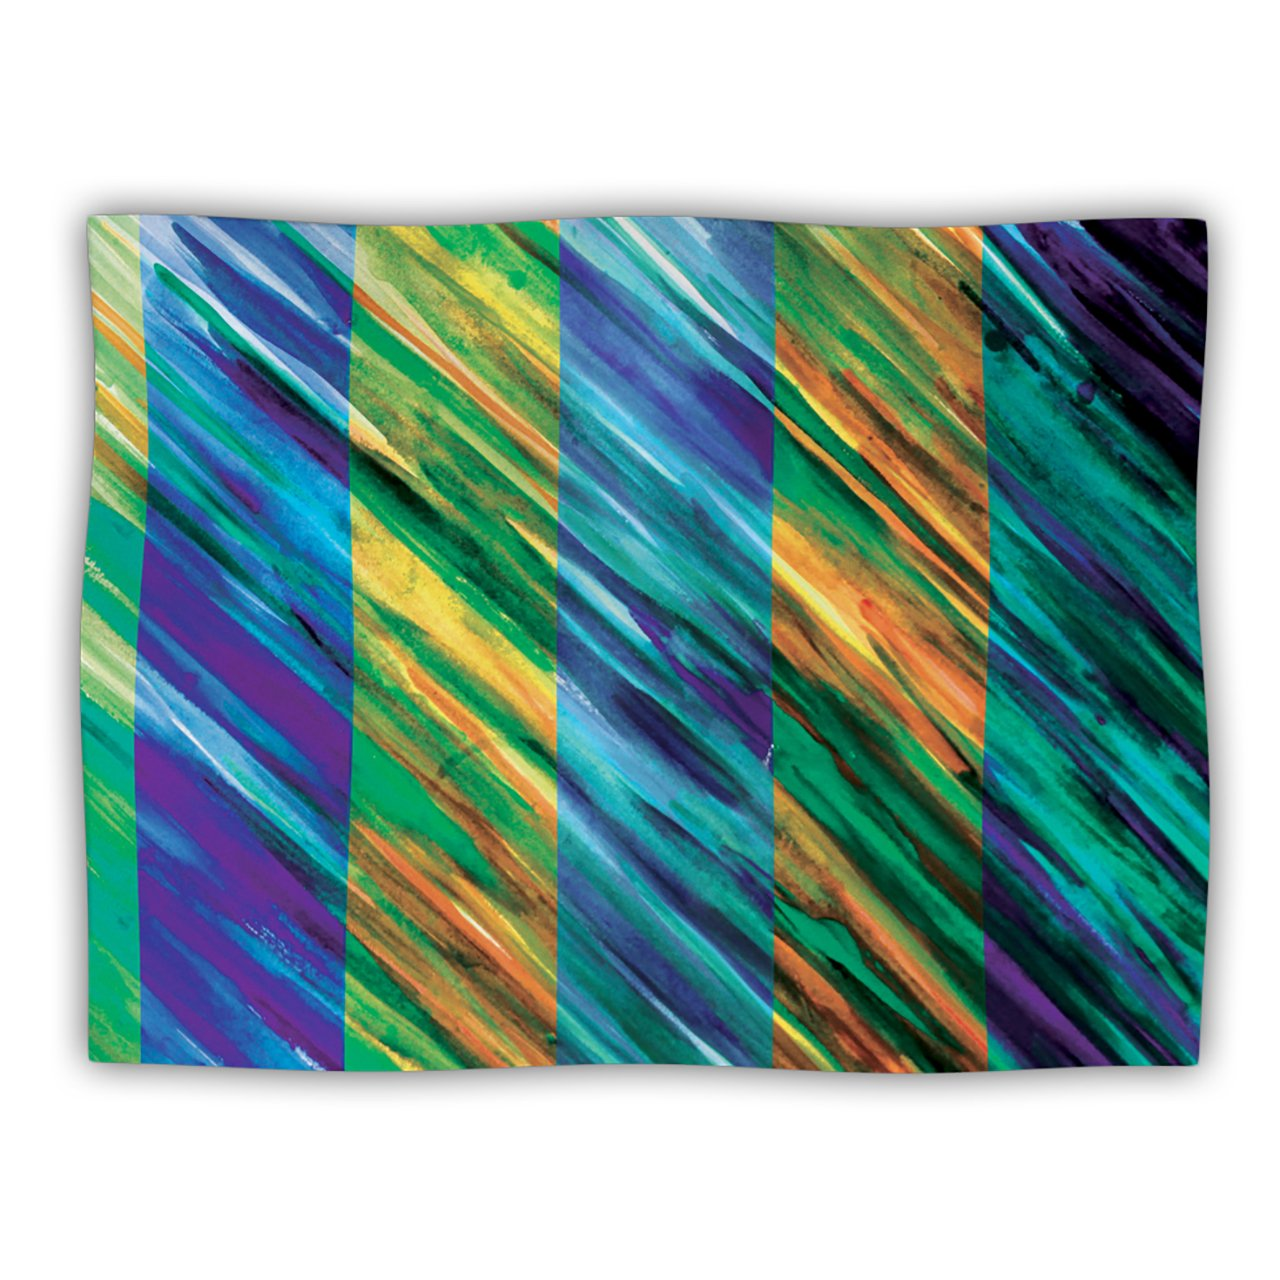 Kess InHouse Theresa Giolzetti Stripes II  Pet Blanket, 60 by 50-Inch